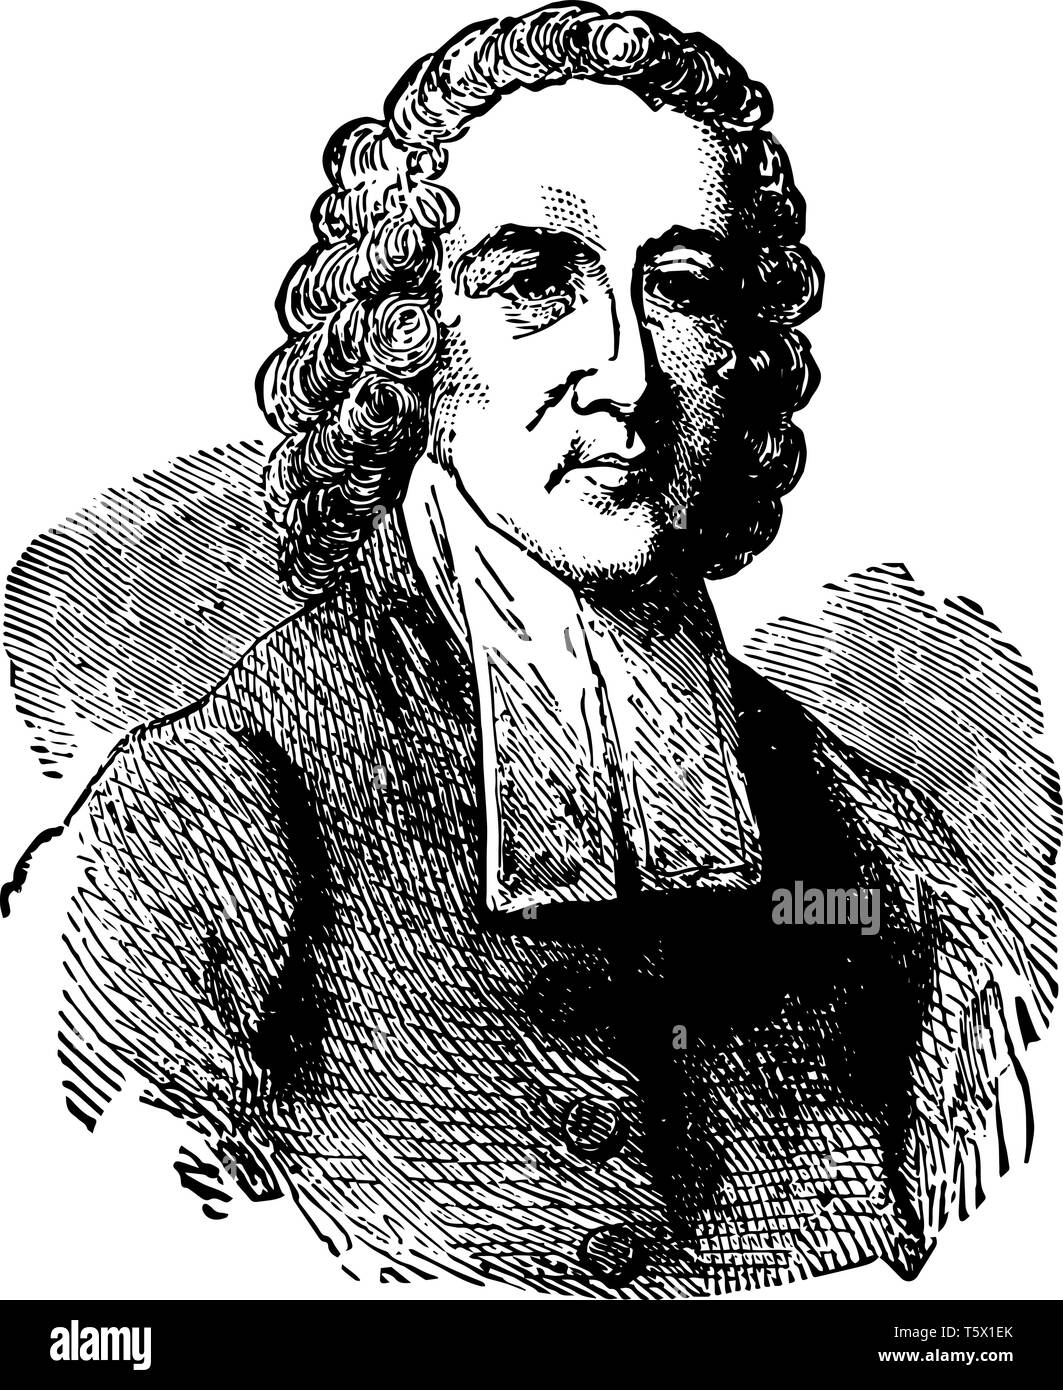 Preacher Stock Vector Images